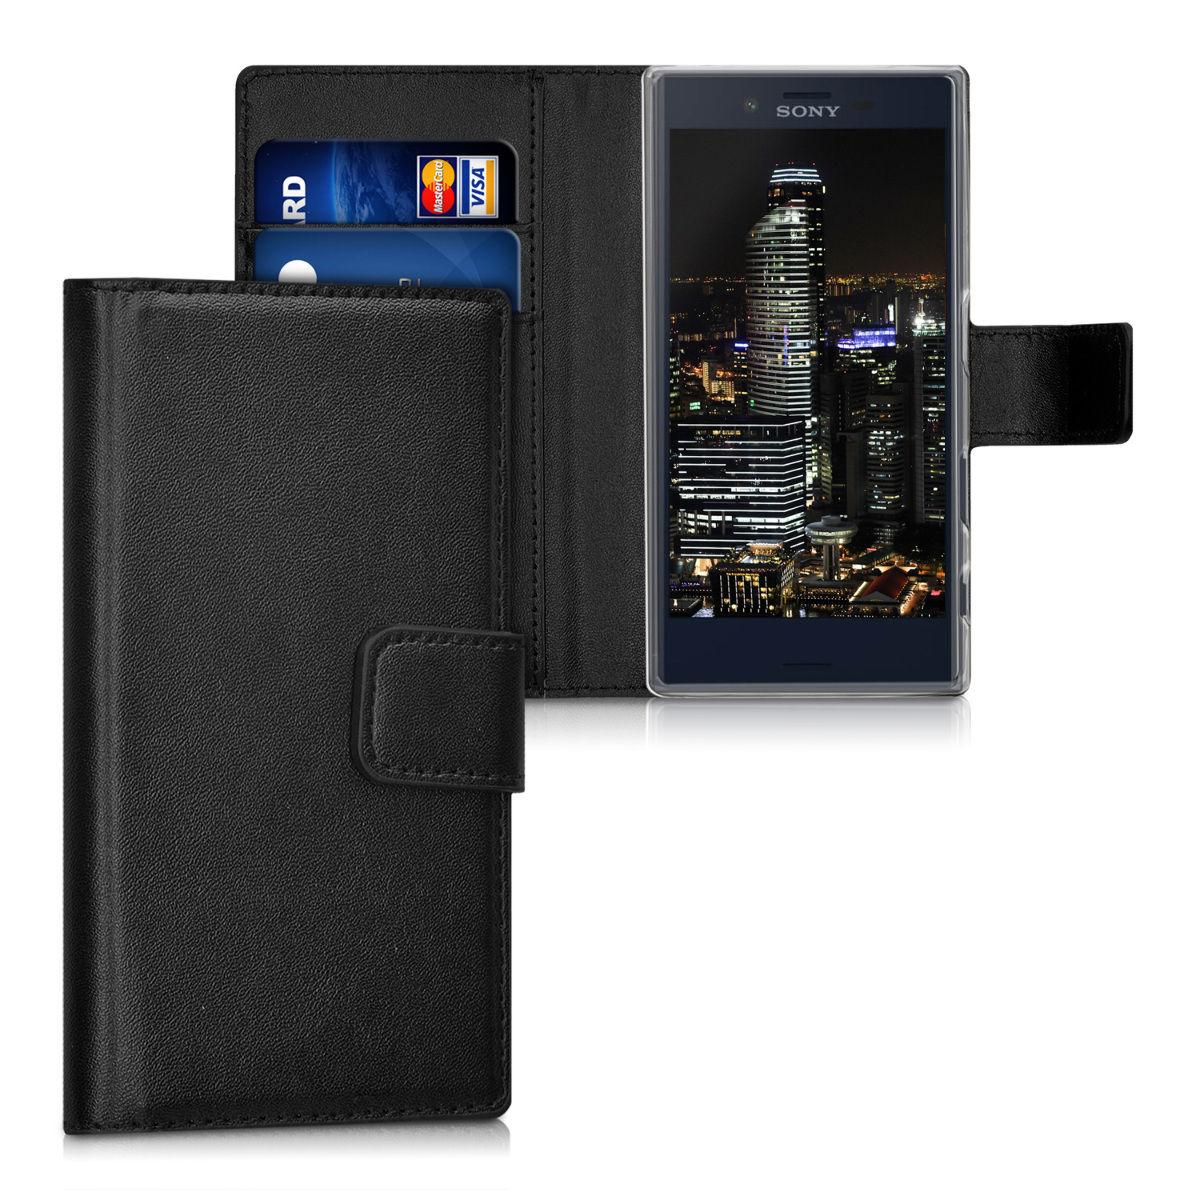 Pouzdro FLIP pro Sony Xperia X Compact černé